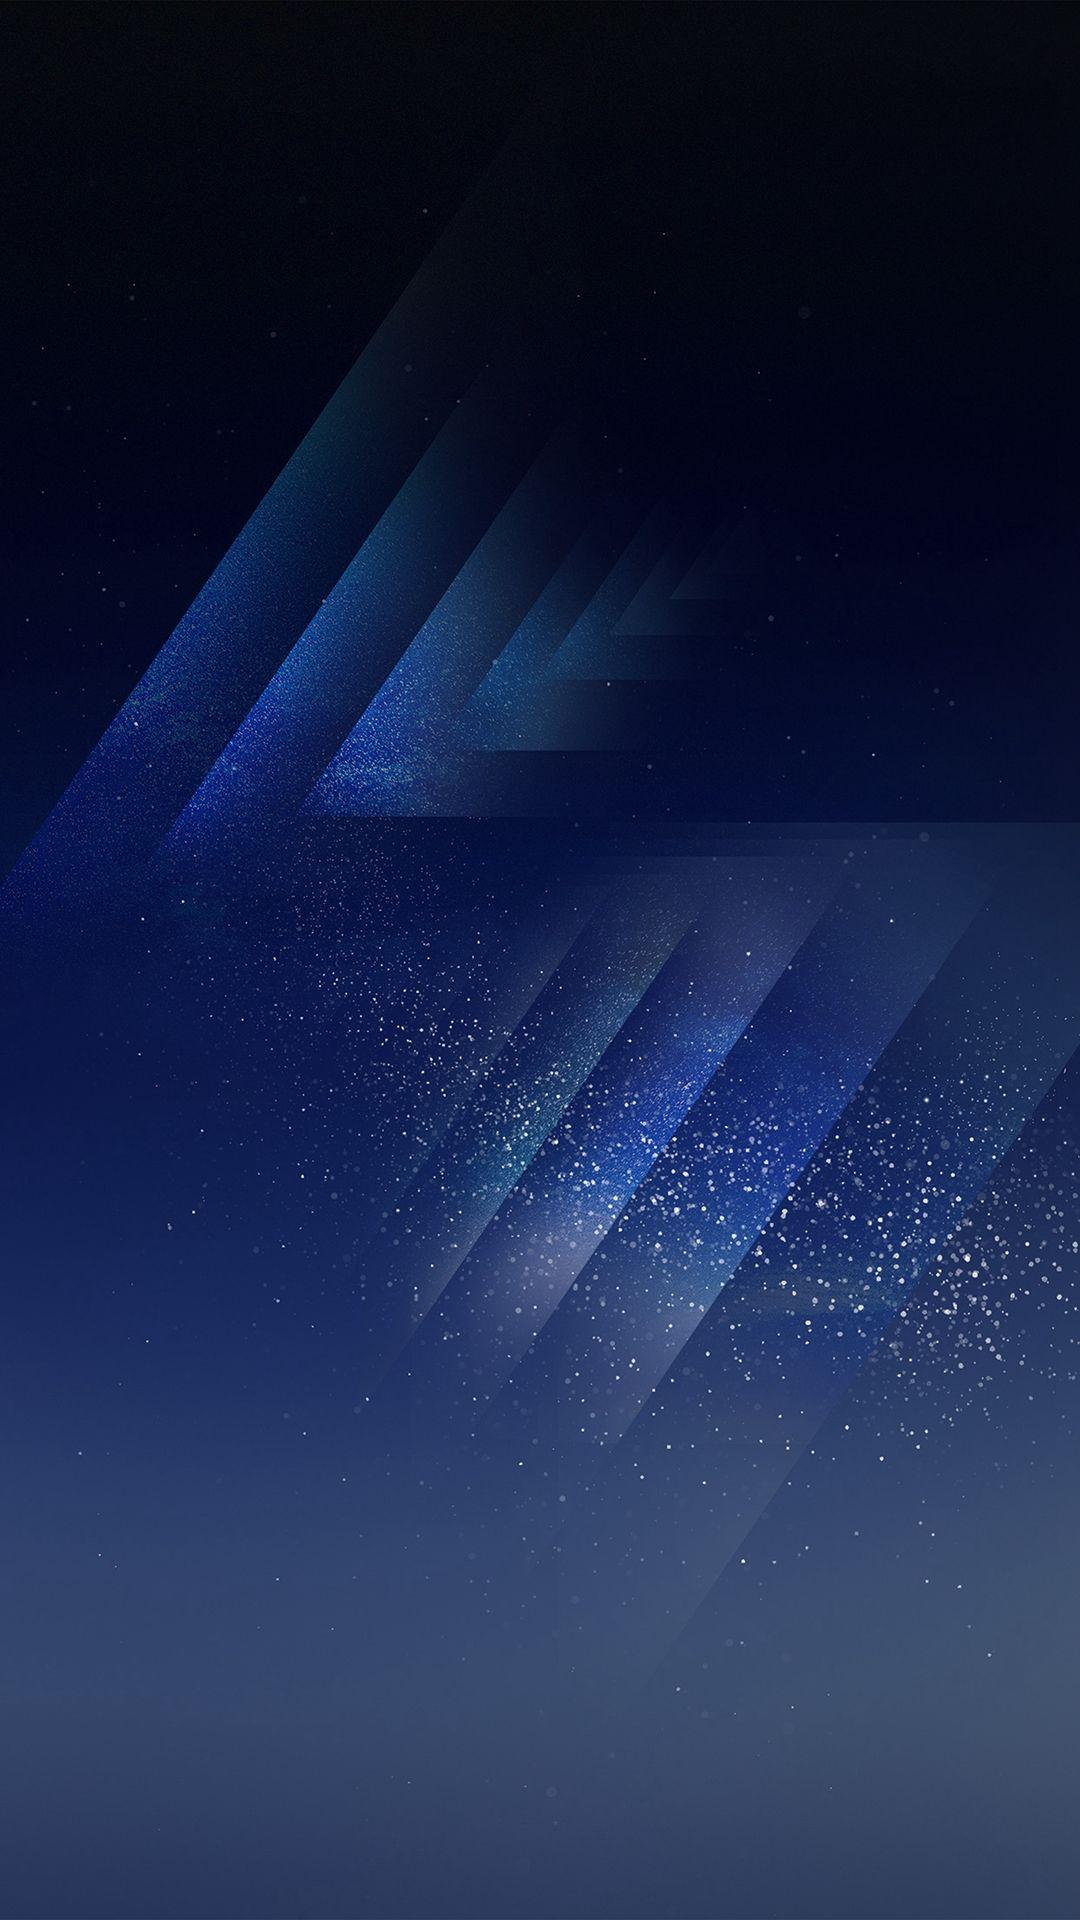 Galaxy S8 Android Dark Star Pattern Background Iphone 8 Wallpaper Samsung Galaxy Wallpaper Samsung S8 Wallpaper Galaxy Wallpaper